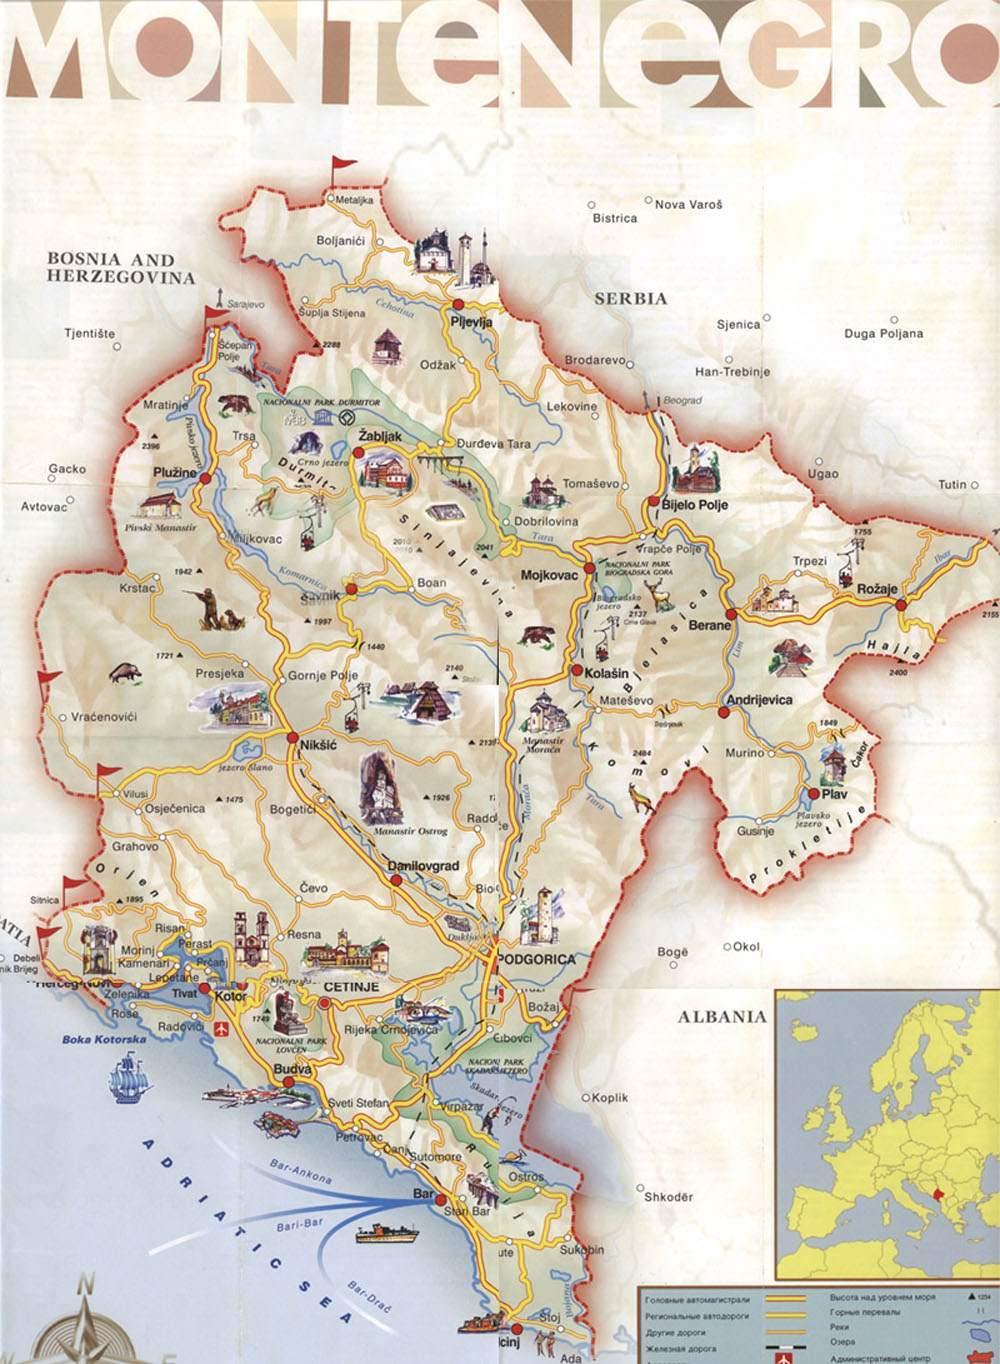 Montenegro_maр Черногория Черногория Montenegro ma D1 80